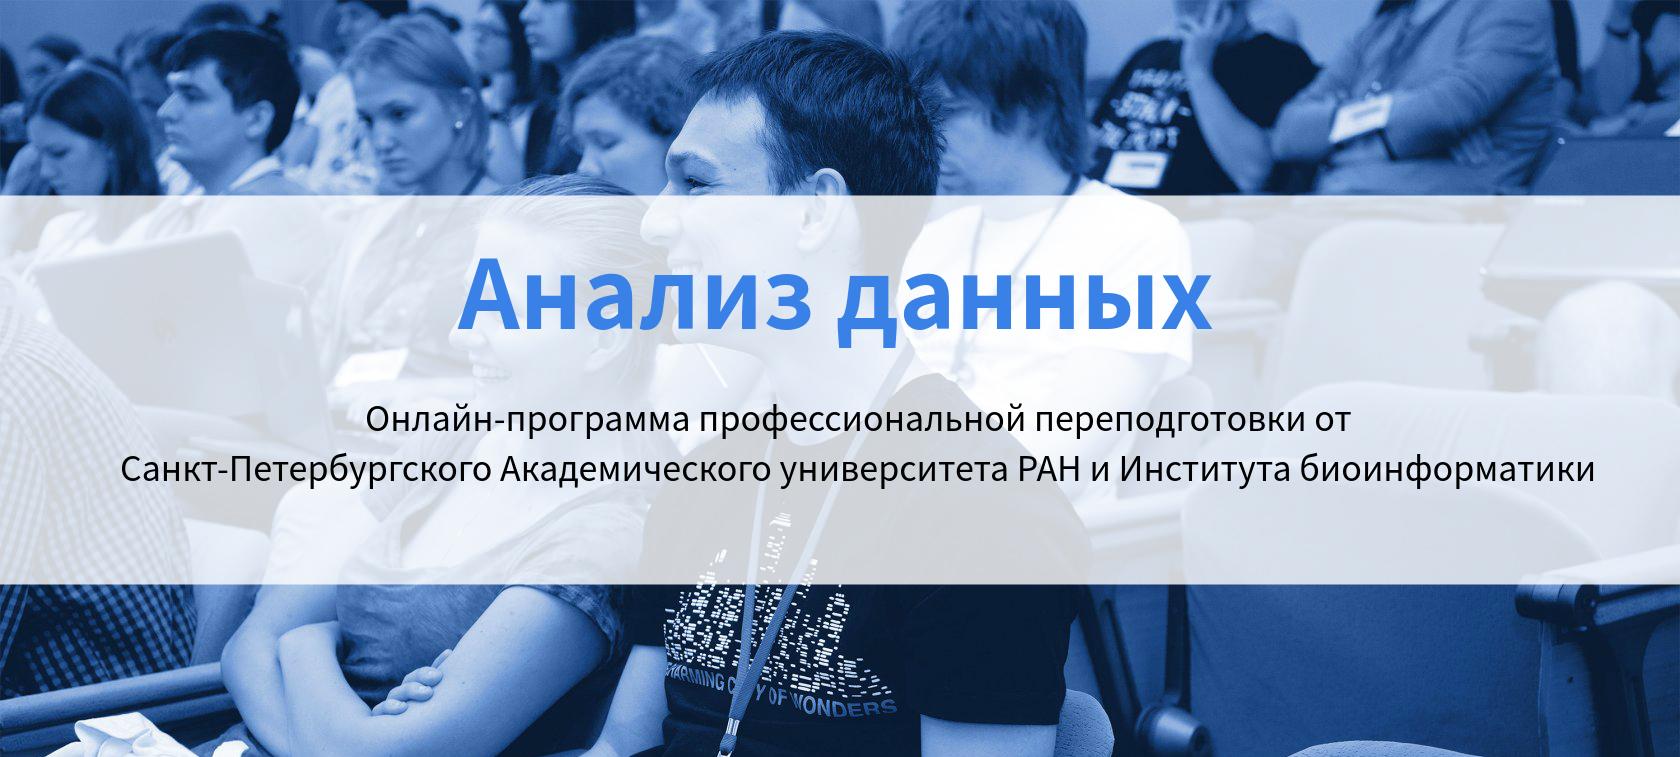 Онлайн-программа по анализу данных на Stepik.org